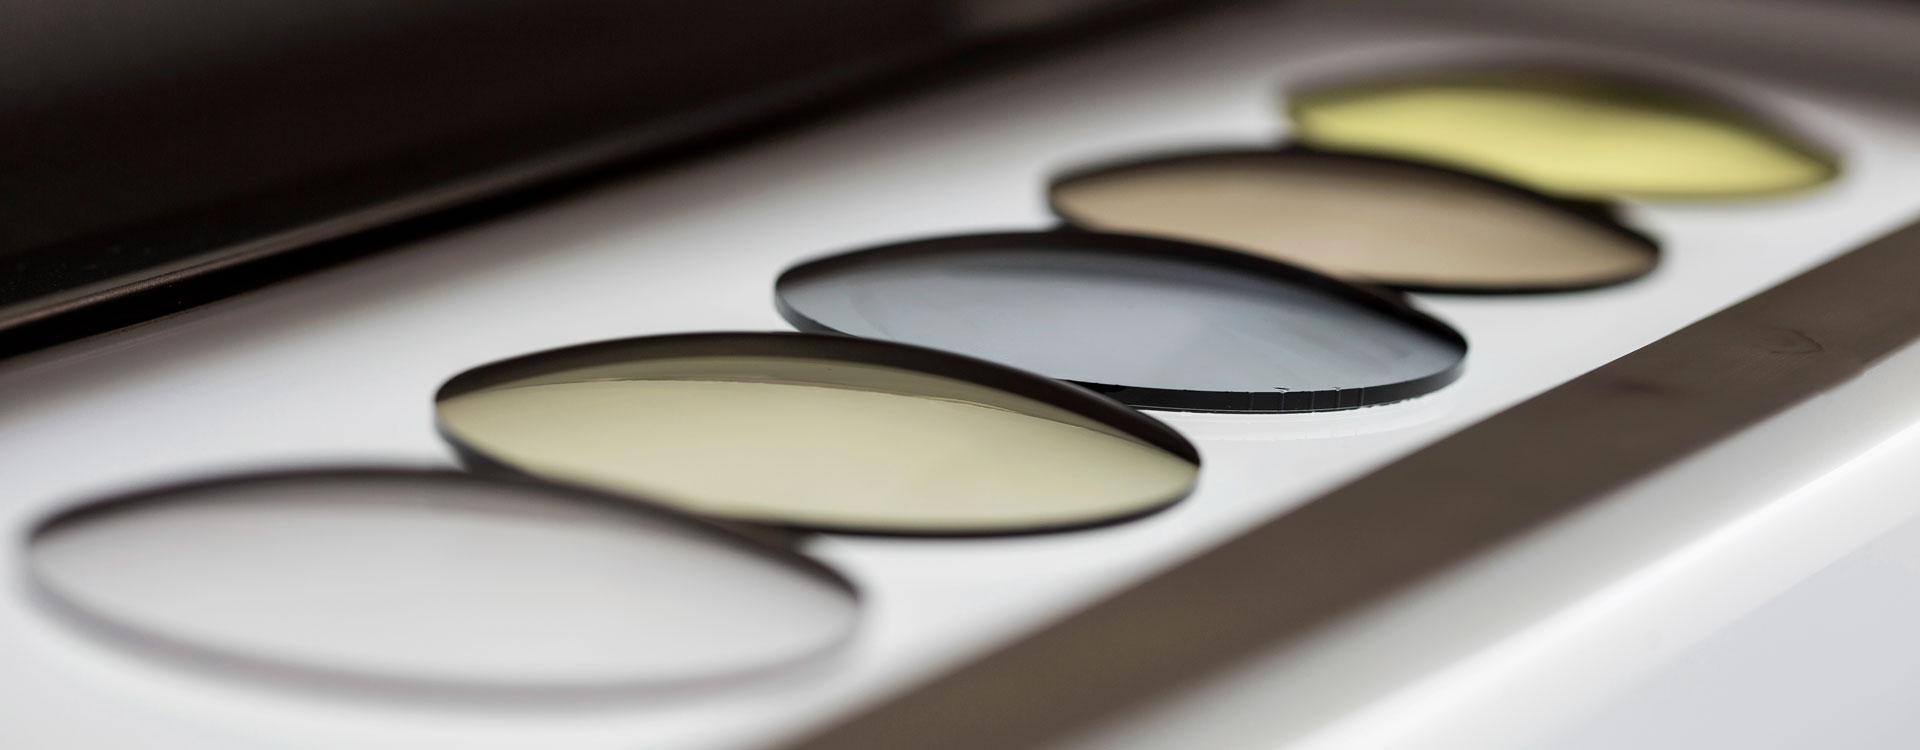 Karamouzis Optical Group lens tints and colors